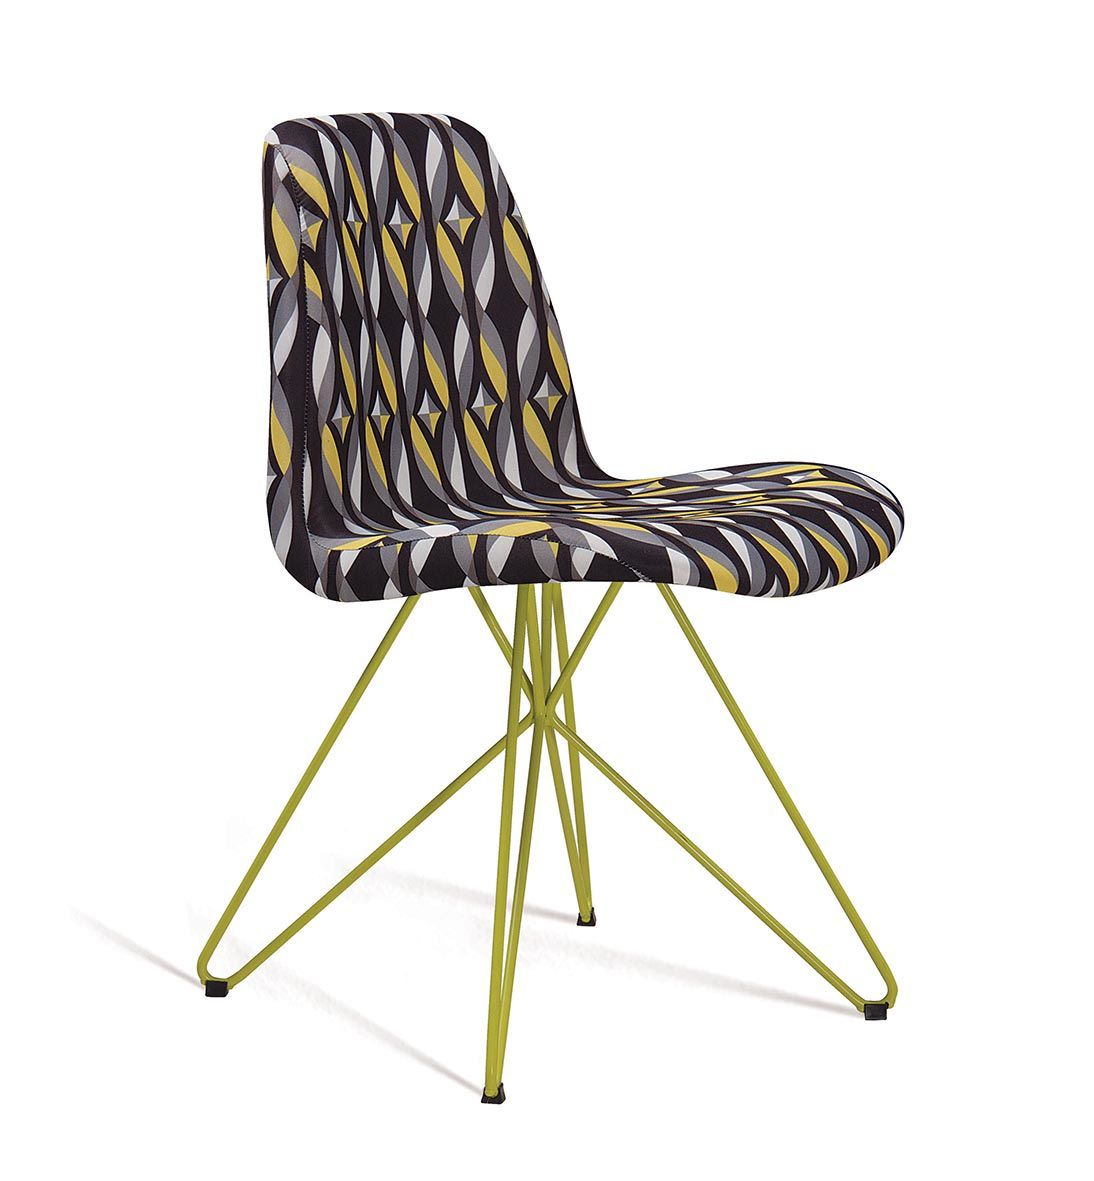 Cadeira Eames Butterfly Color Preto Base Amarela Tecido Suede DAF